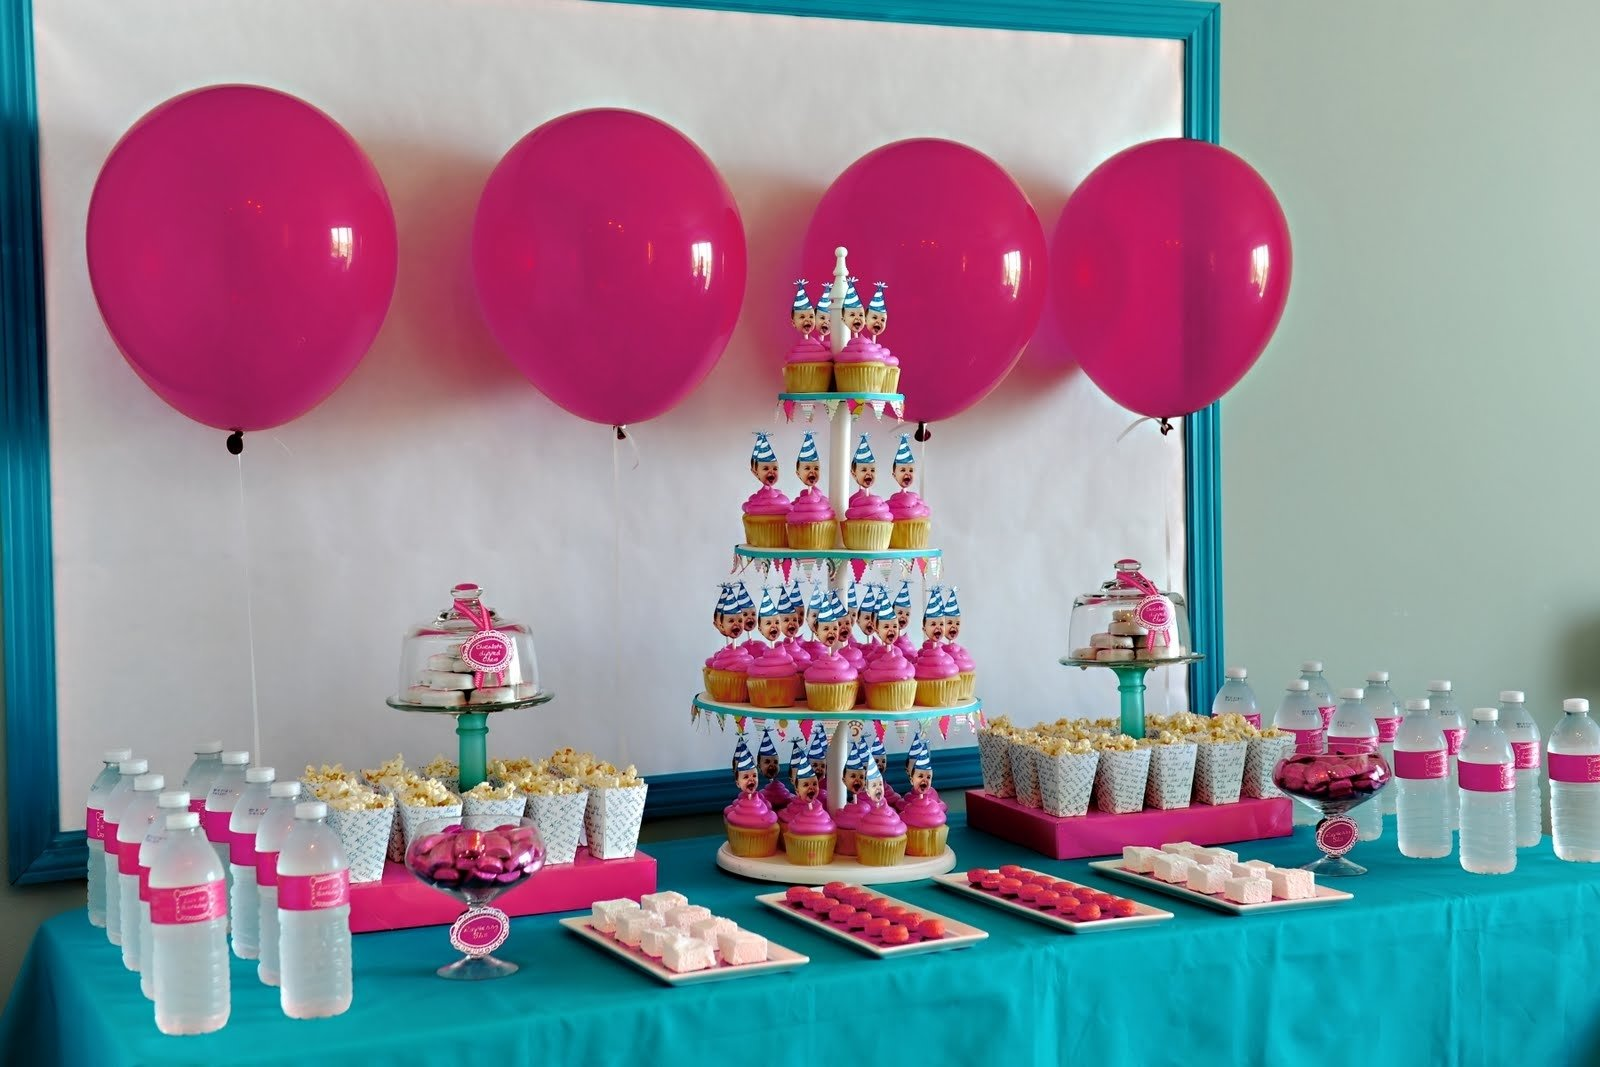 10 Wonderful 25 Year Old Birthday Party Ideas bright ideas birthday party game for 10 year olds best 25 games on 2020